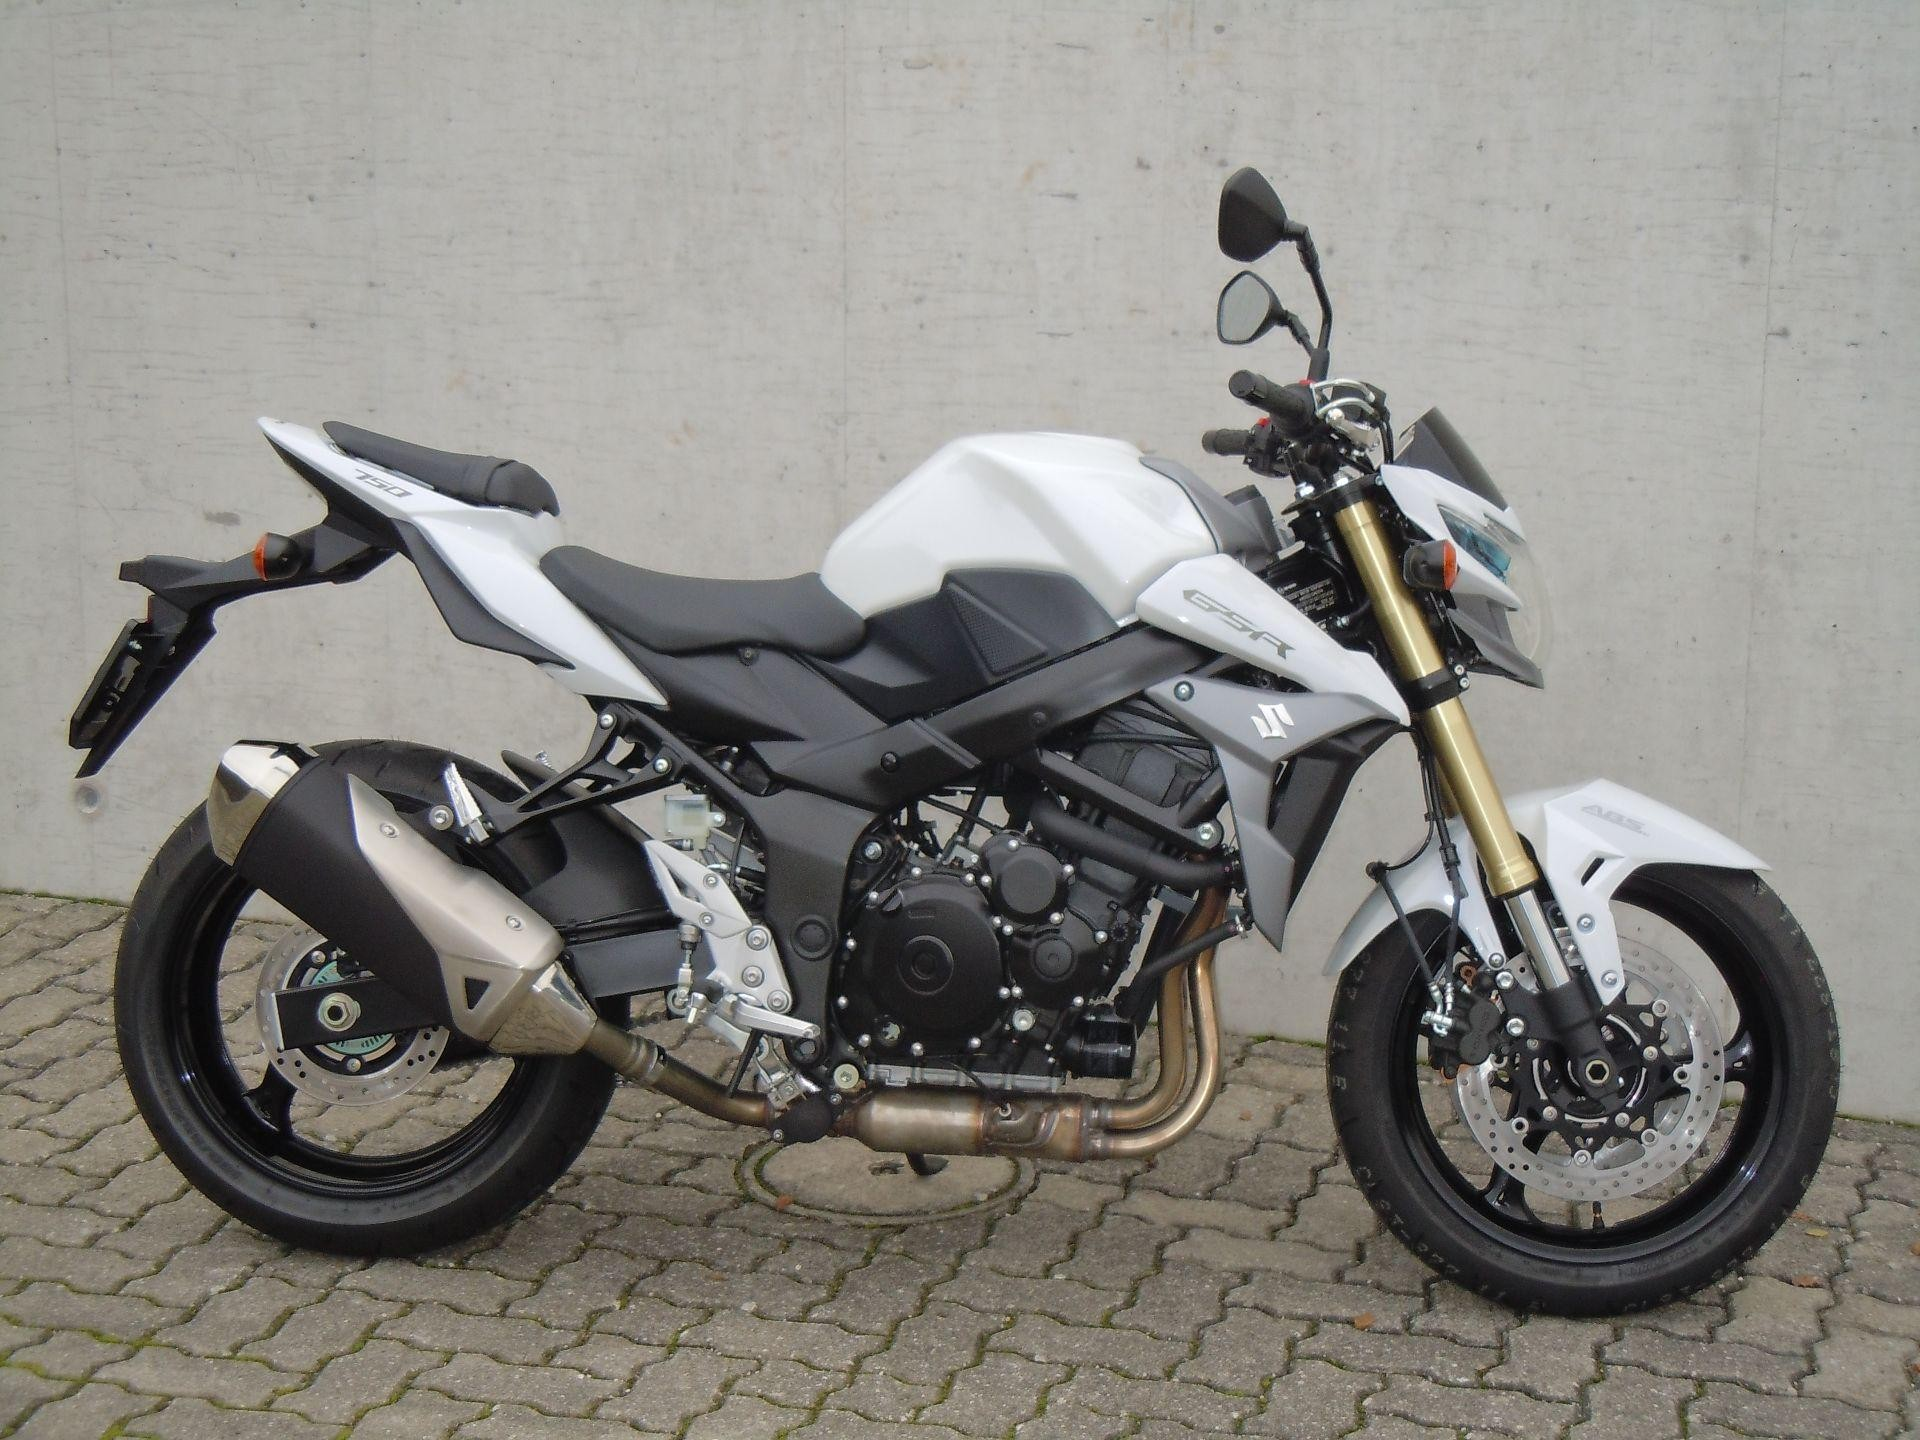 moto neuve acheter suzuki gsr 750 a rolf gall superbikes ag b tzberg. Black Bedroom Furniture Sets. Home Design Ideas